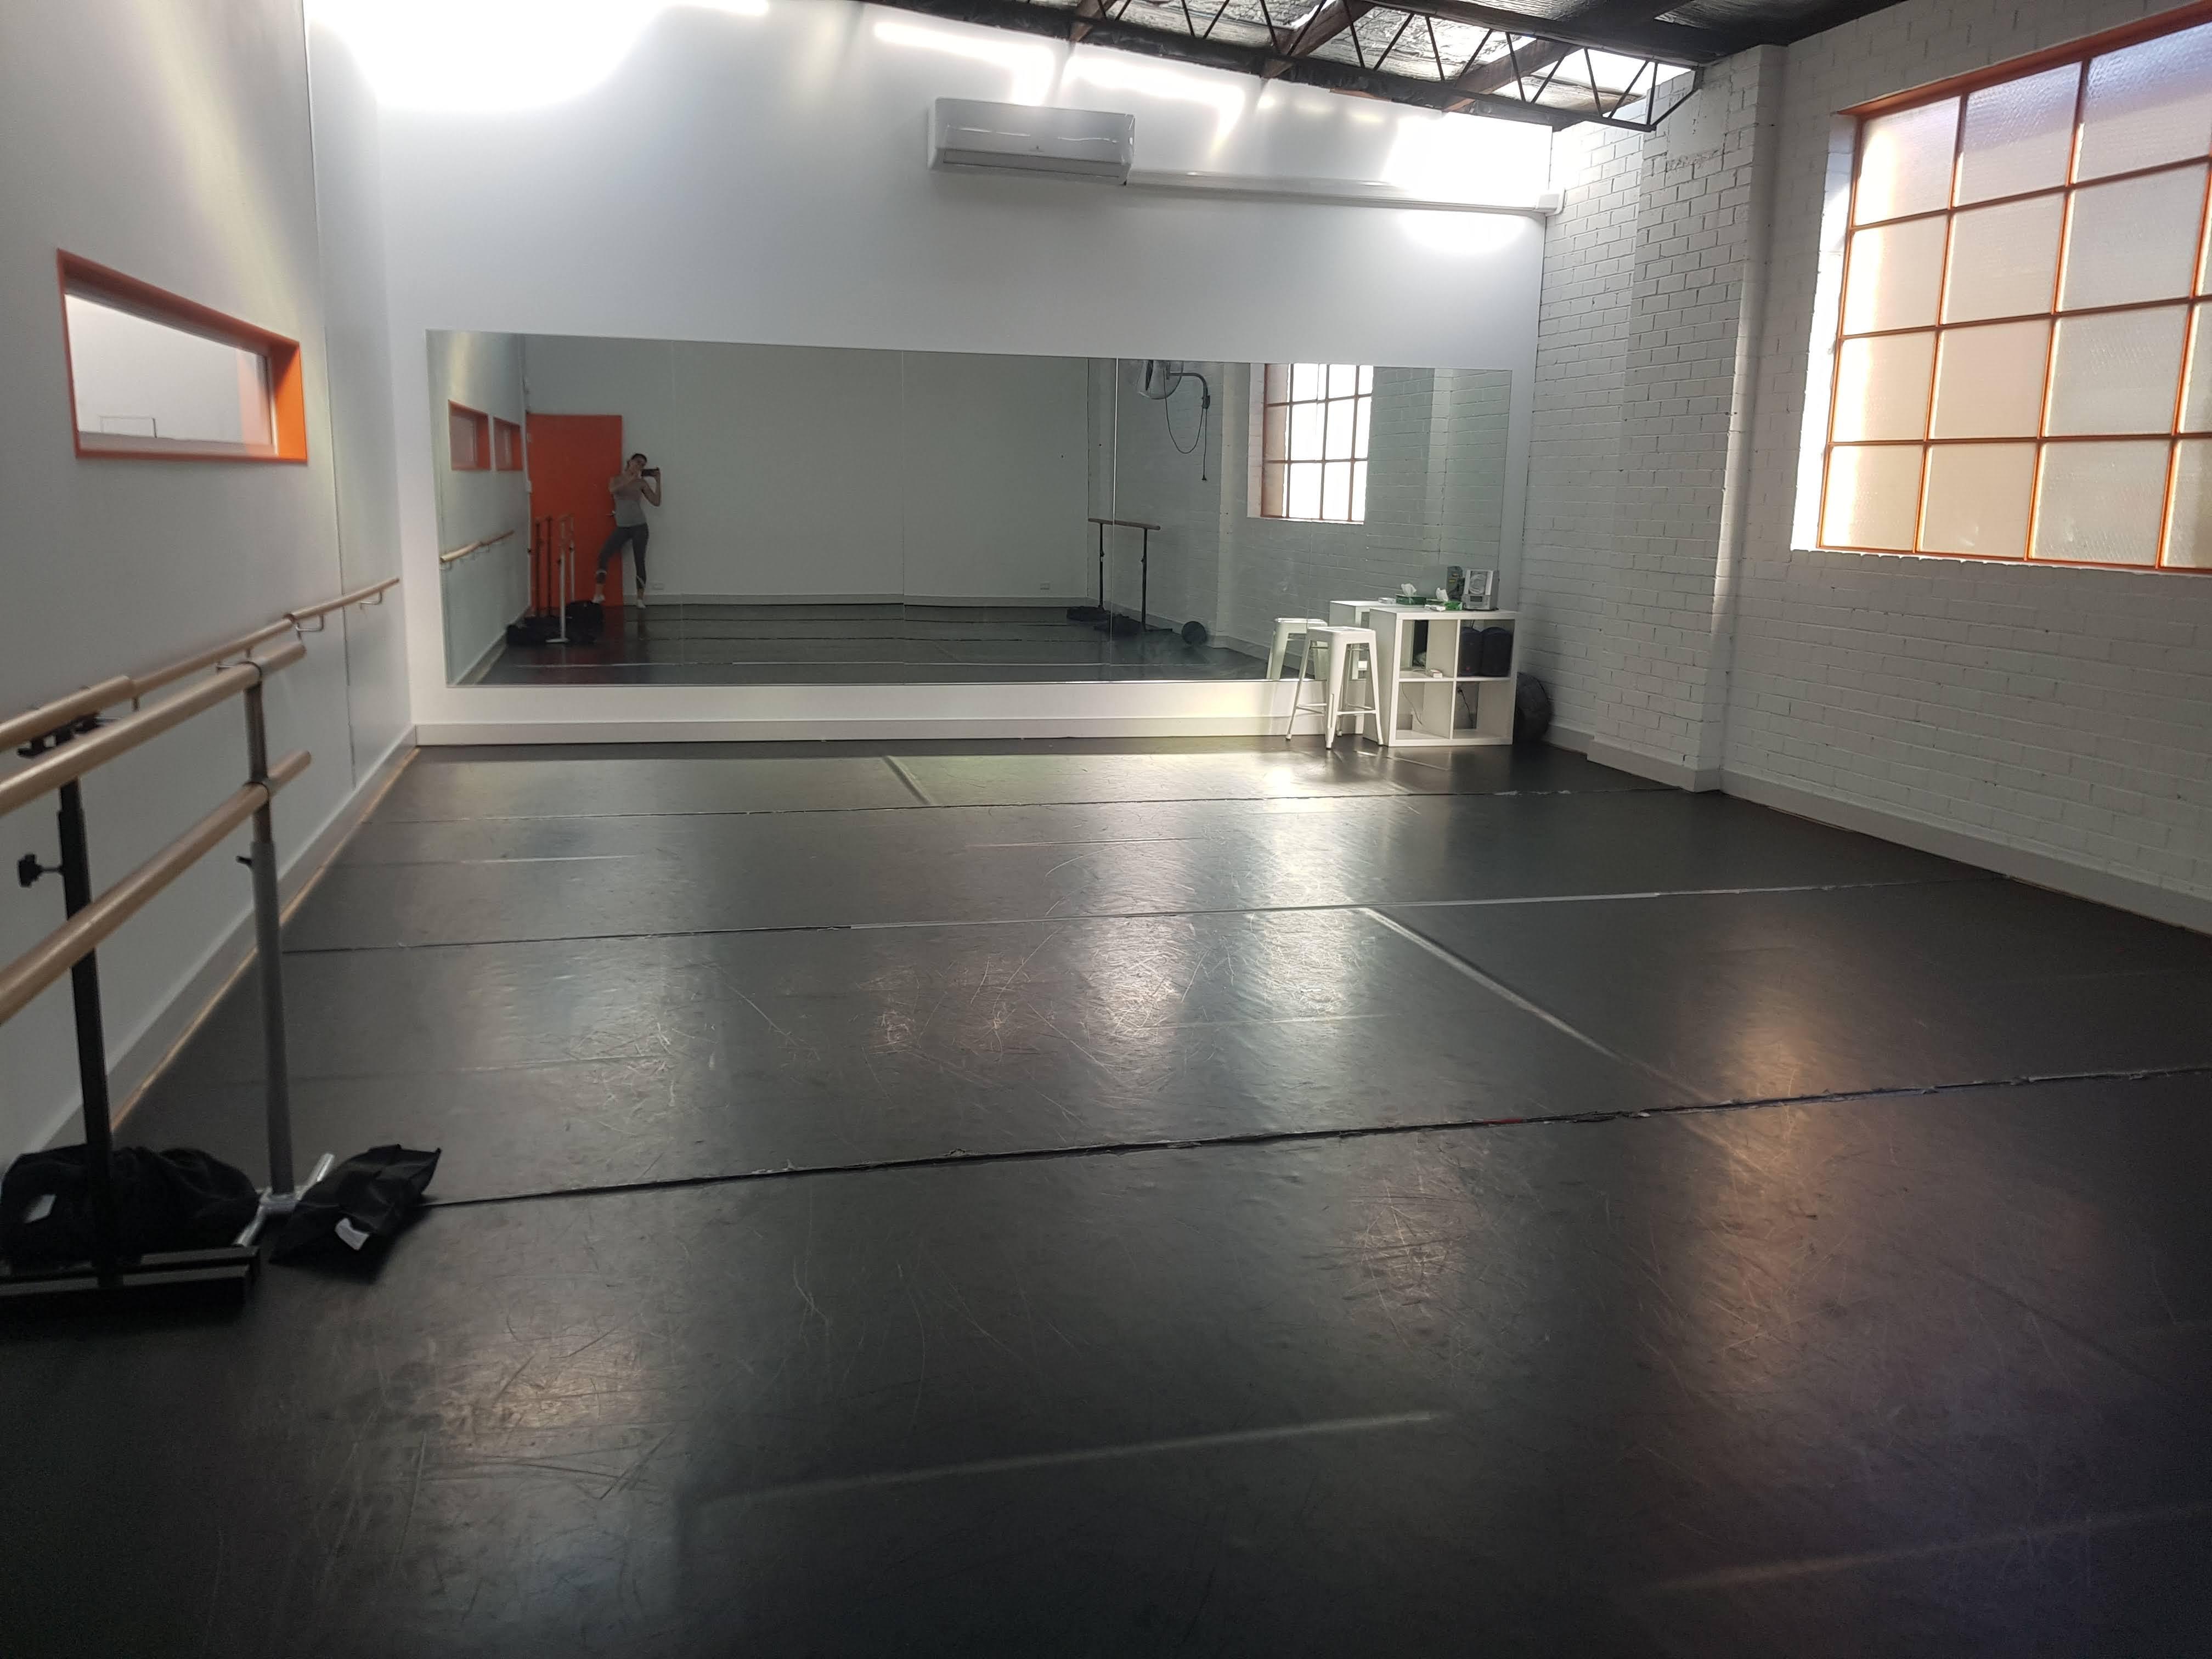 Studio B, multi-use area at La Vérité Dance Projects, image 1